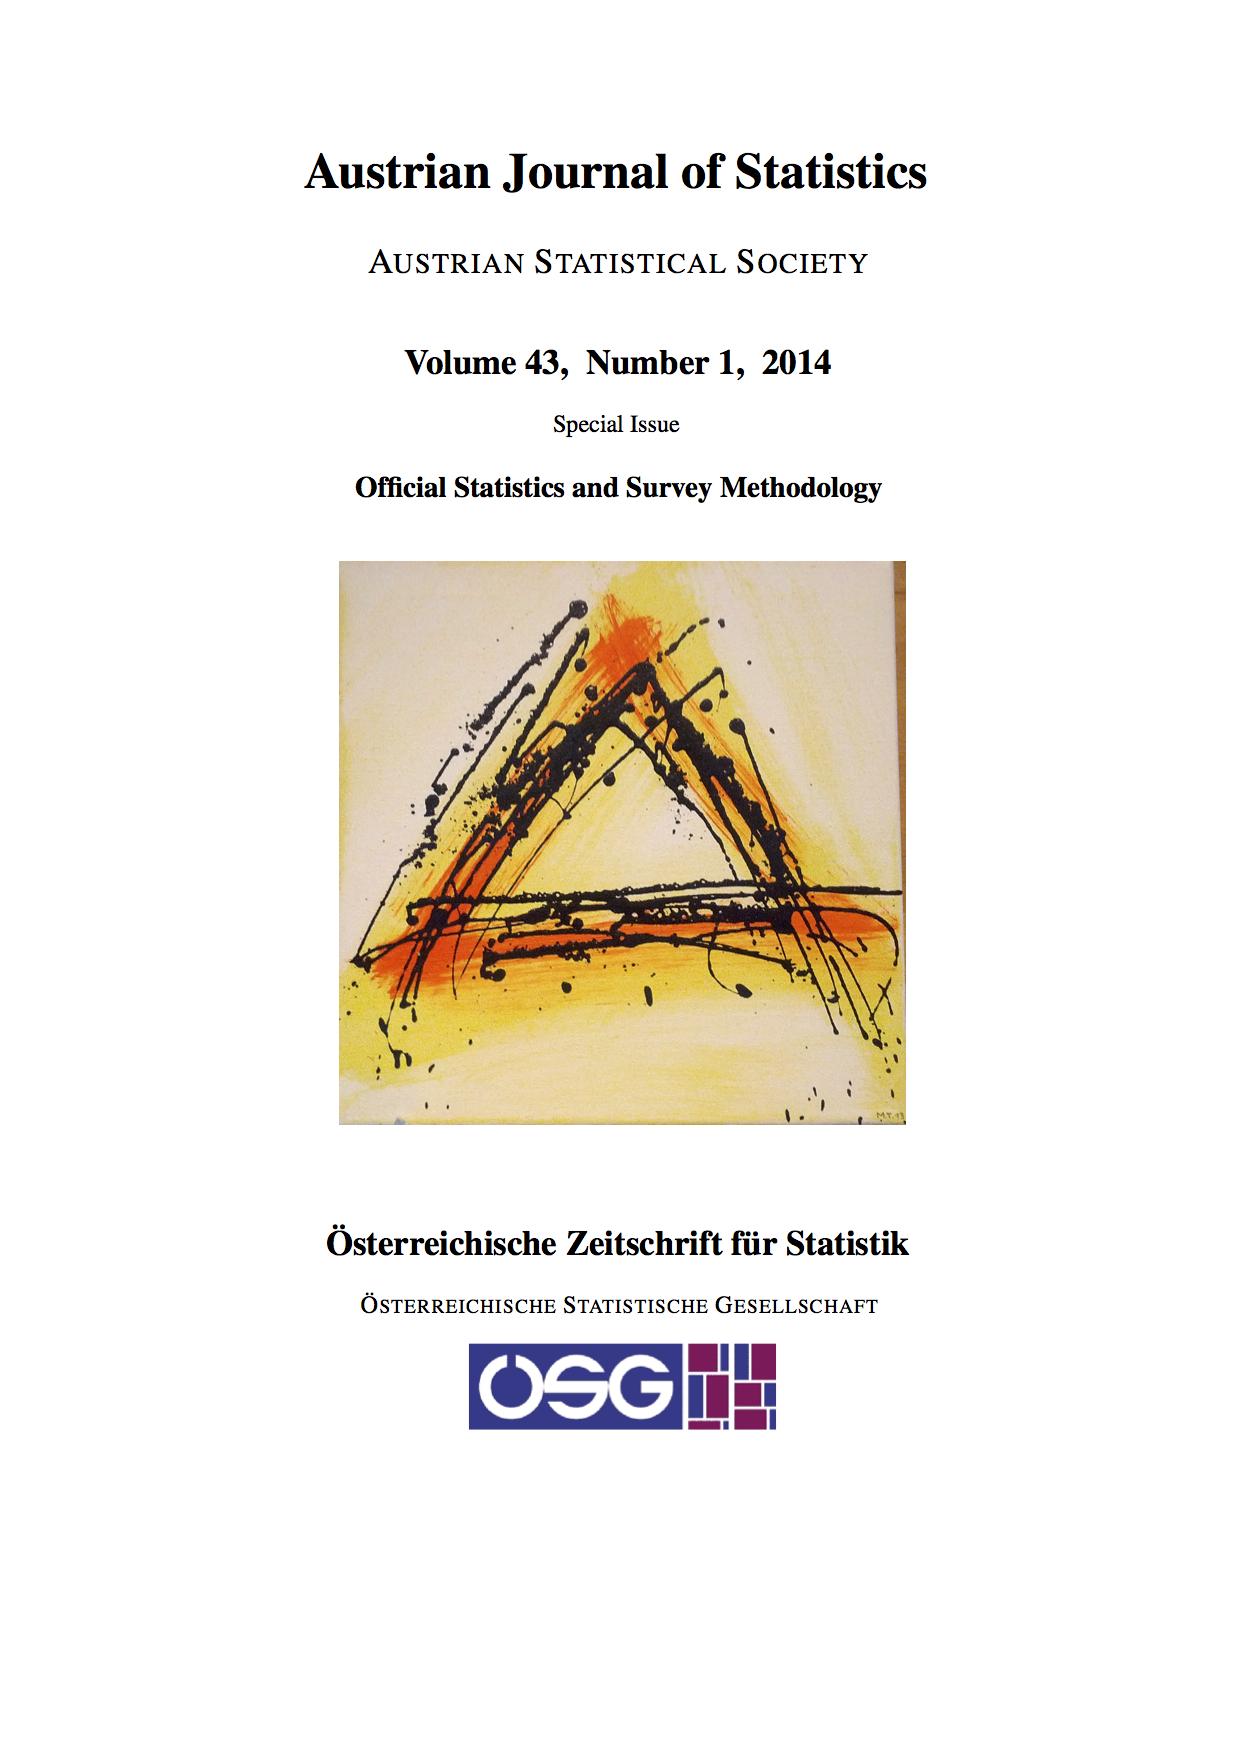 View Vol. 43 No. 1 (2014)